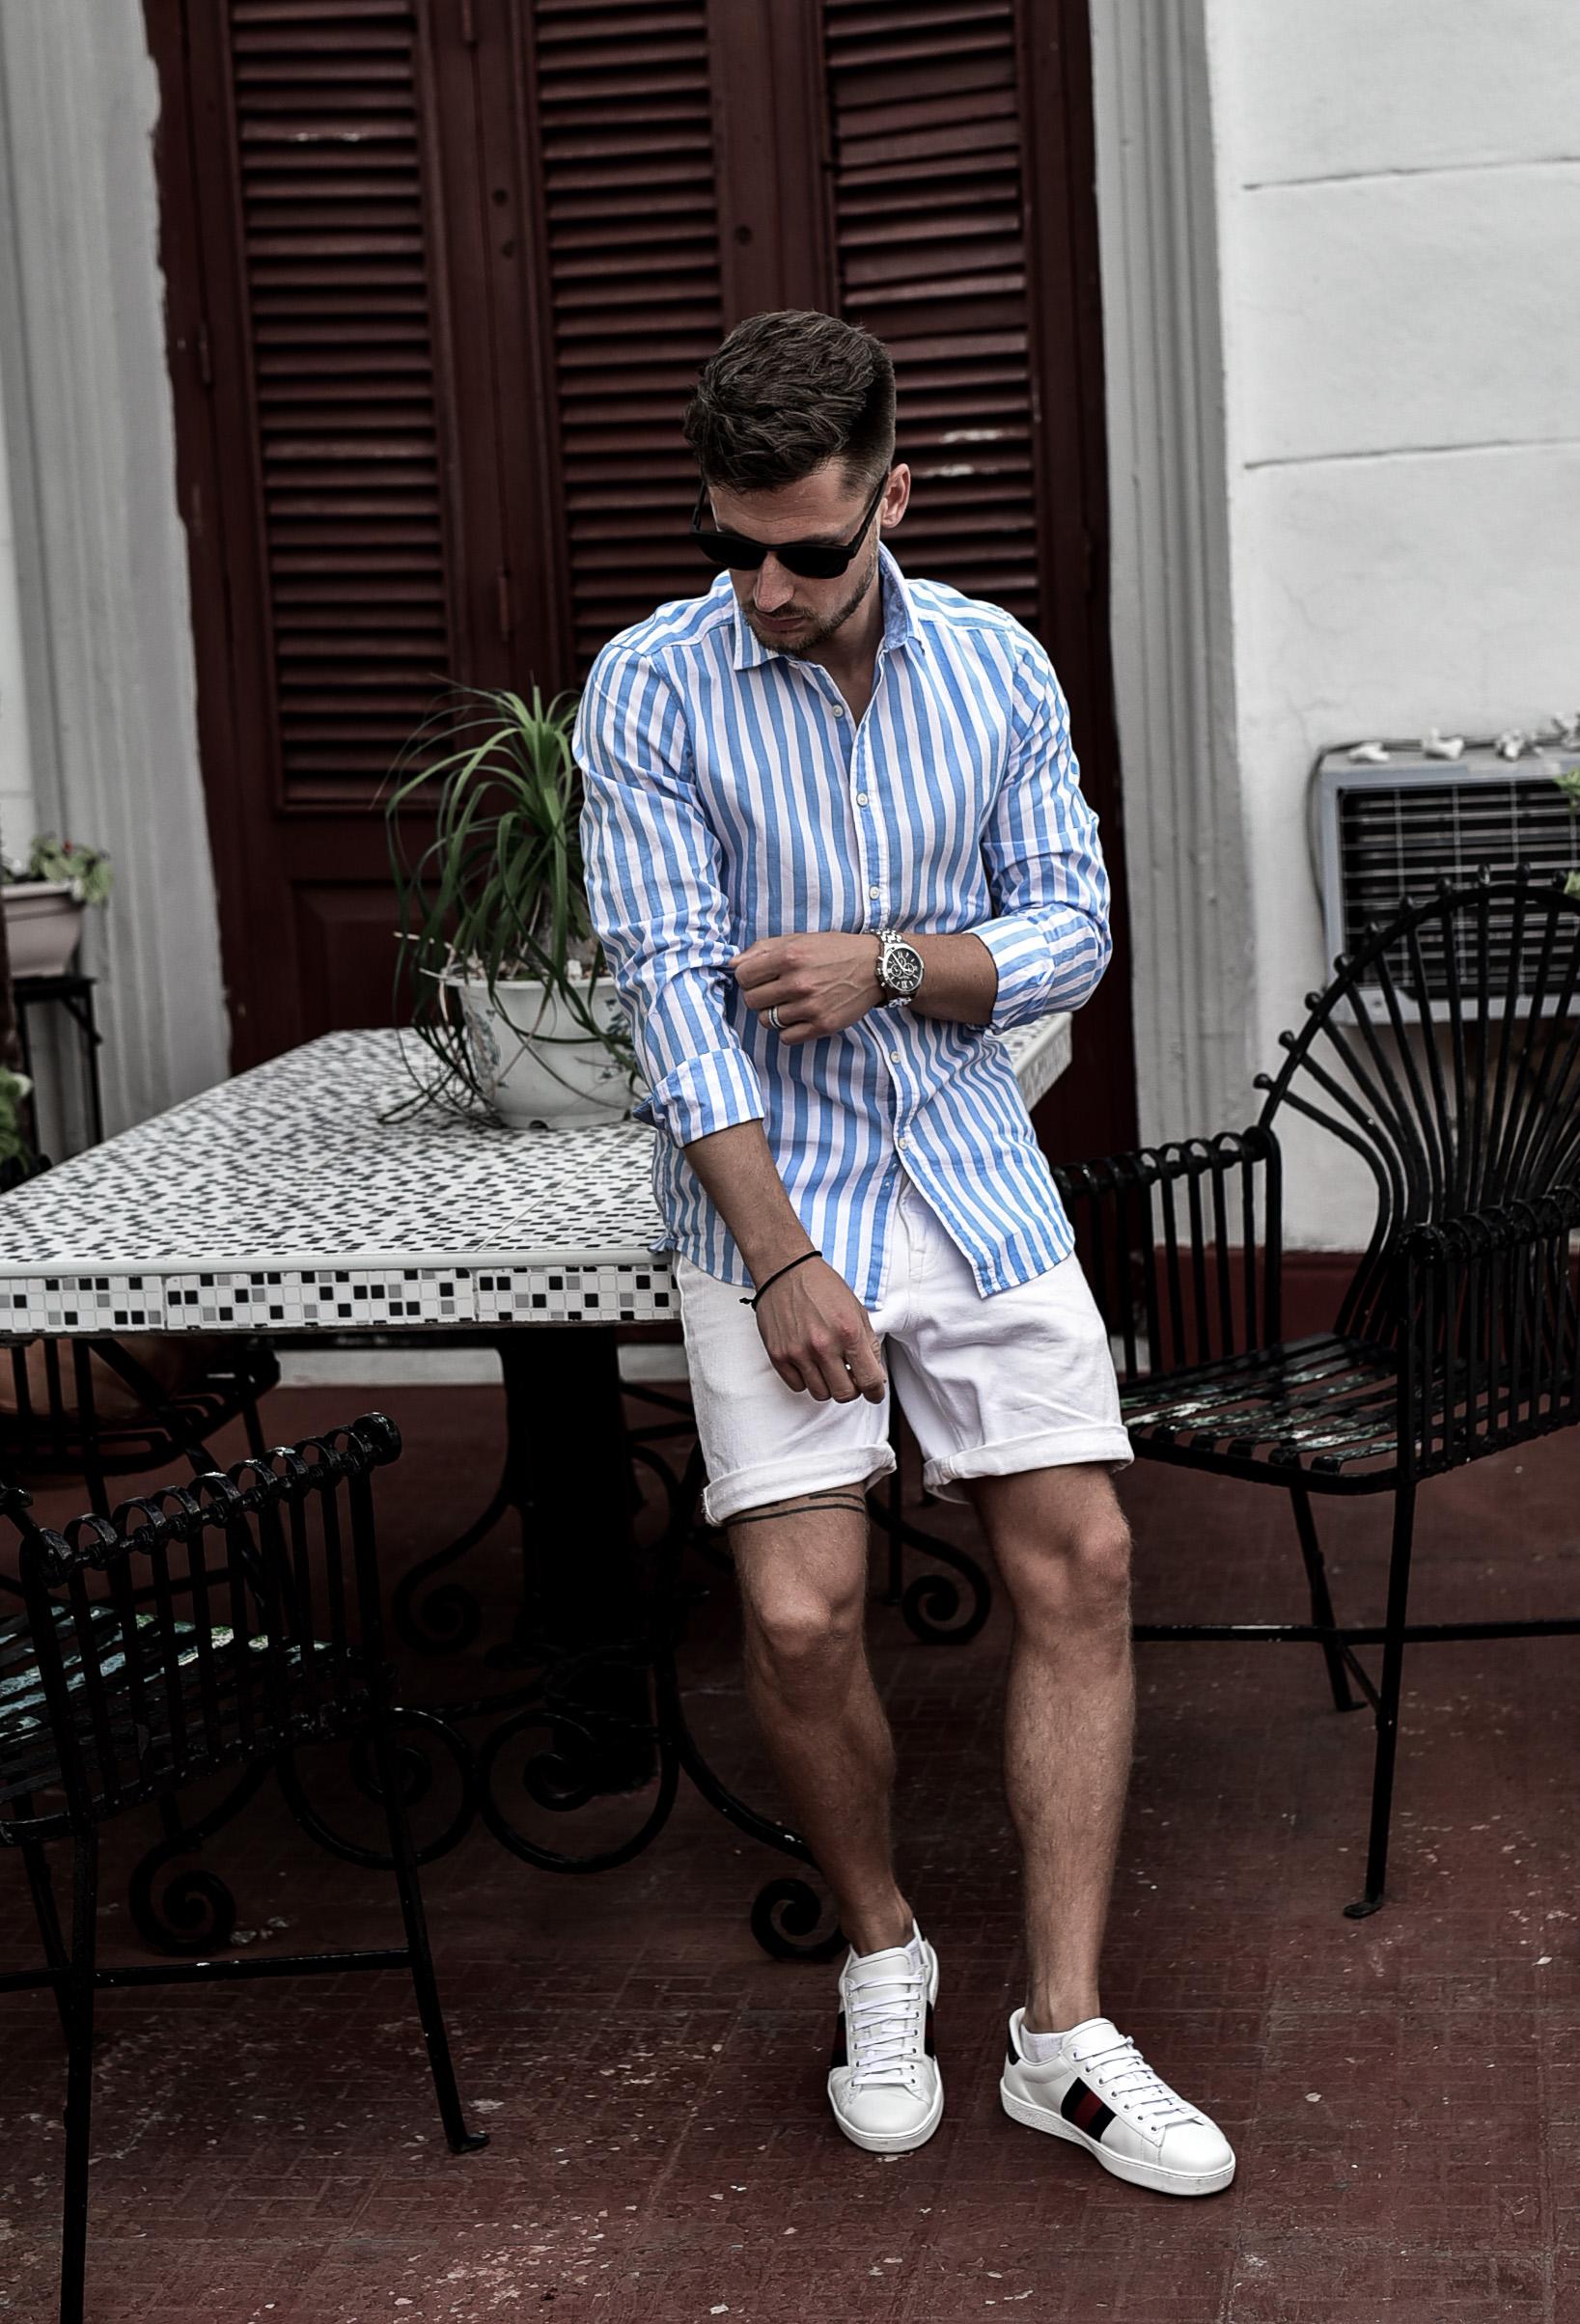 Tommeezjerry-Maennermodeblog-Maennermode-Fashionblog-Styleblog-Berlinblog--Lifestyleblog-Olymp-Hemden-Havana-Cuba-Outfit-Casual-Chic-1